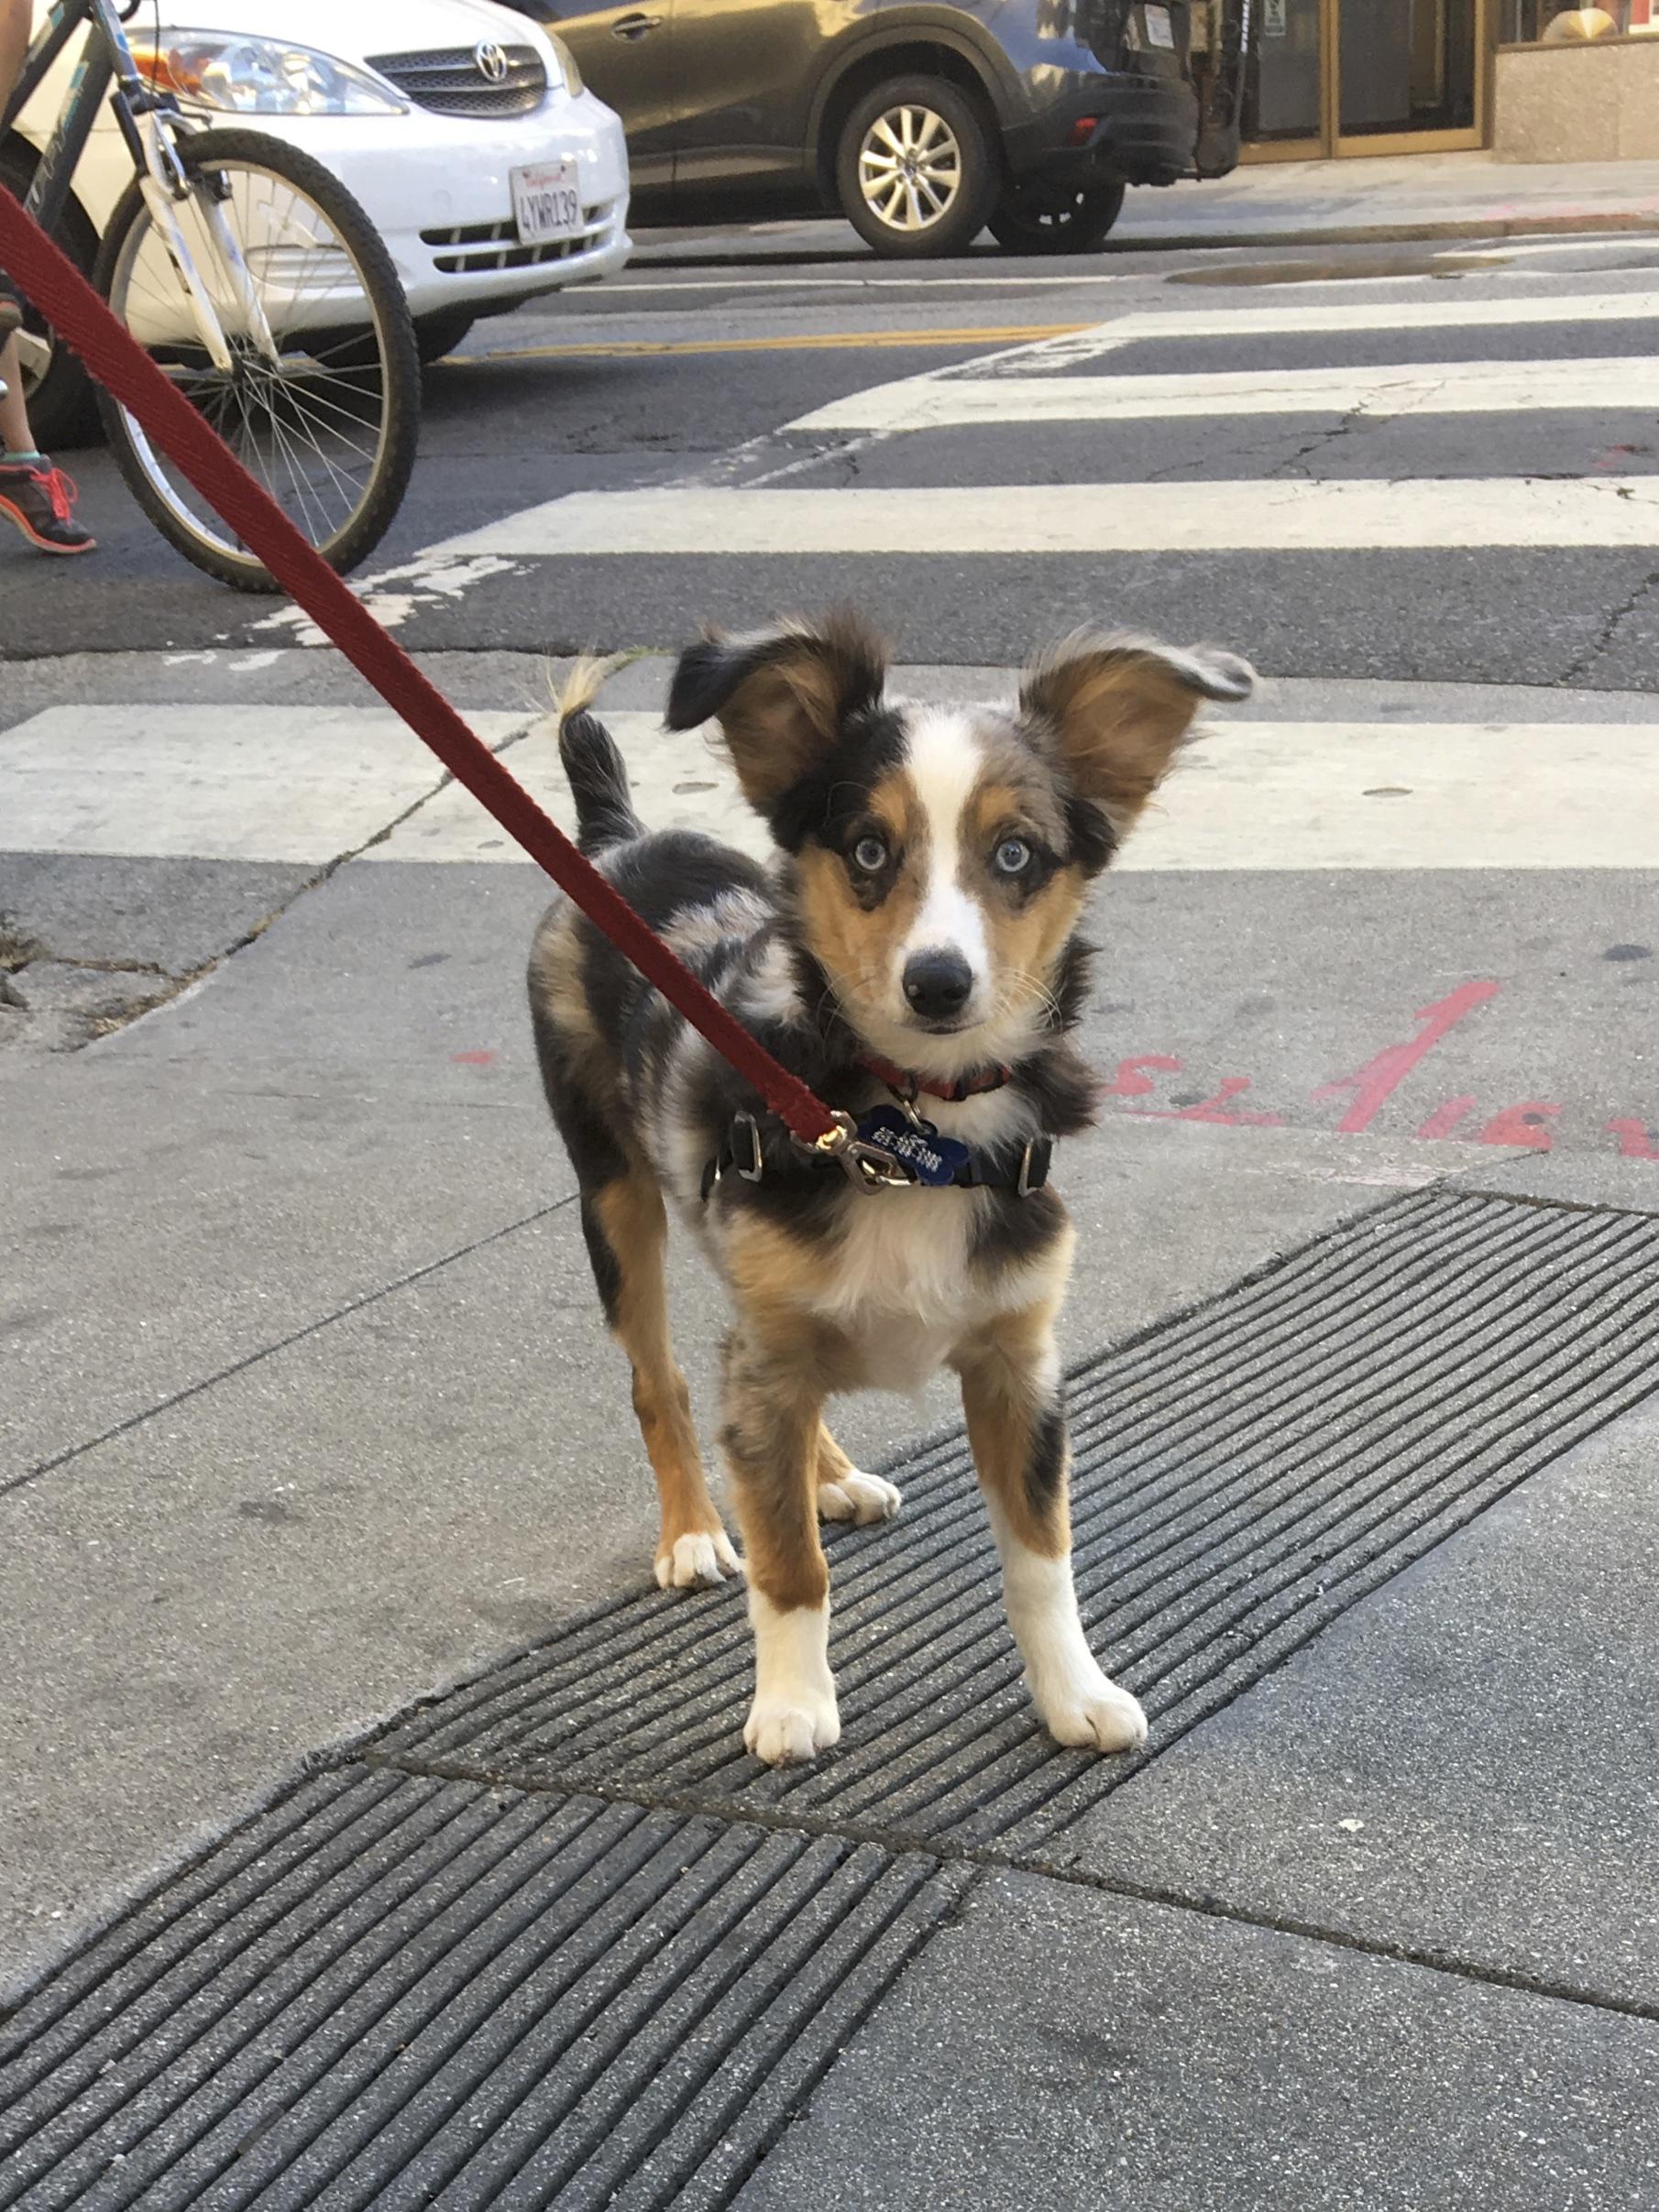 Miniature Tricolor Australian Shepherd Puppy With Humongous Ears